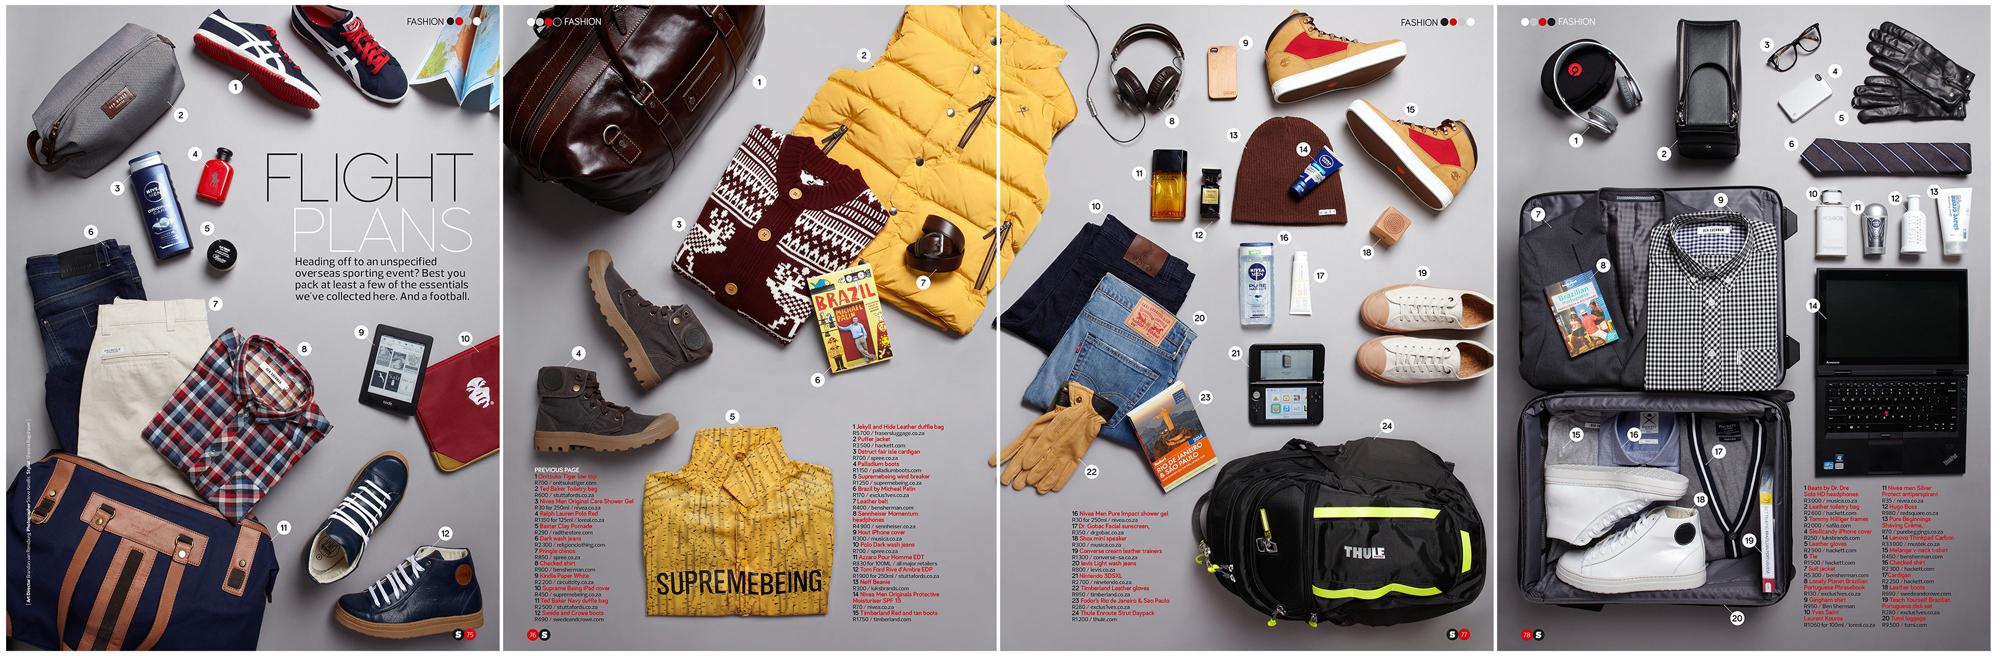 Stuff_Magazine_5